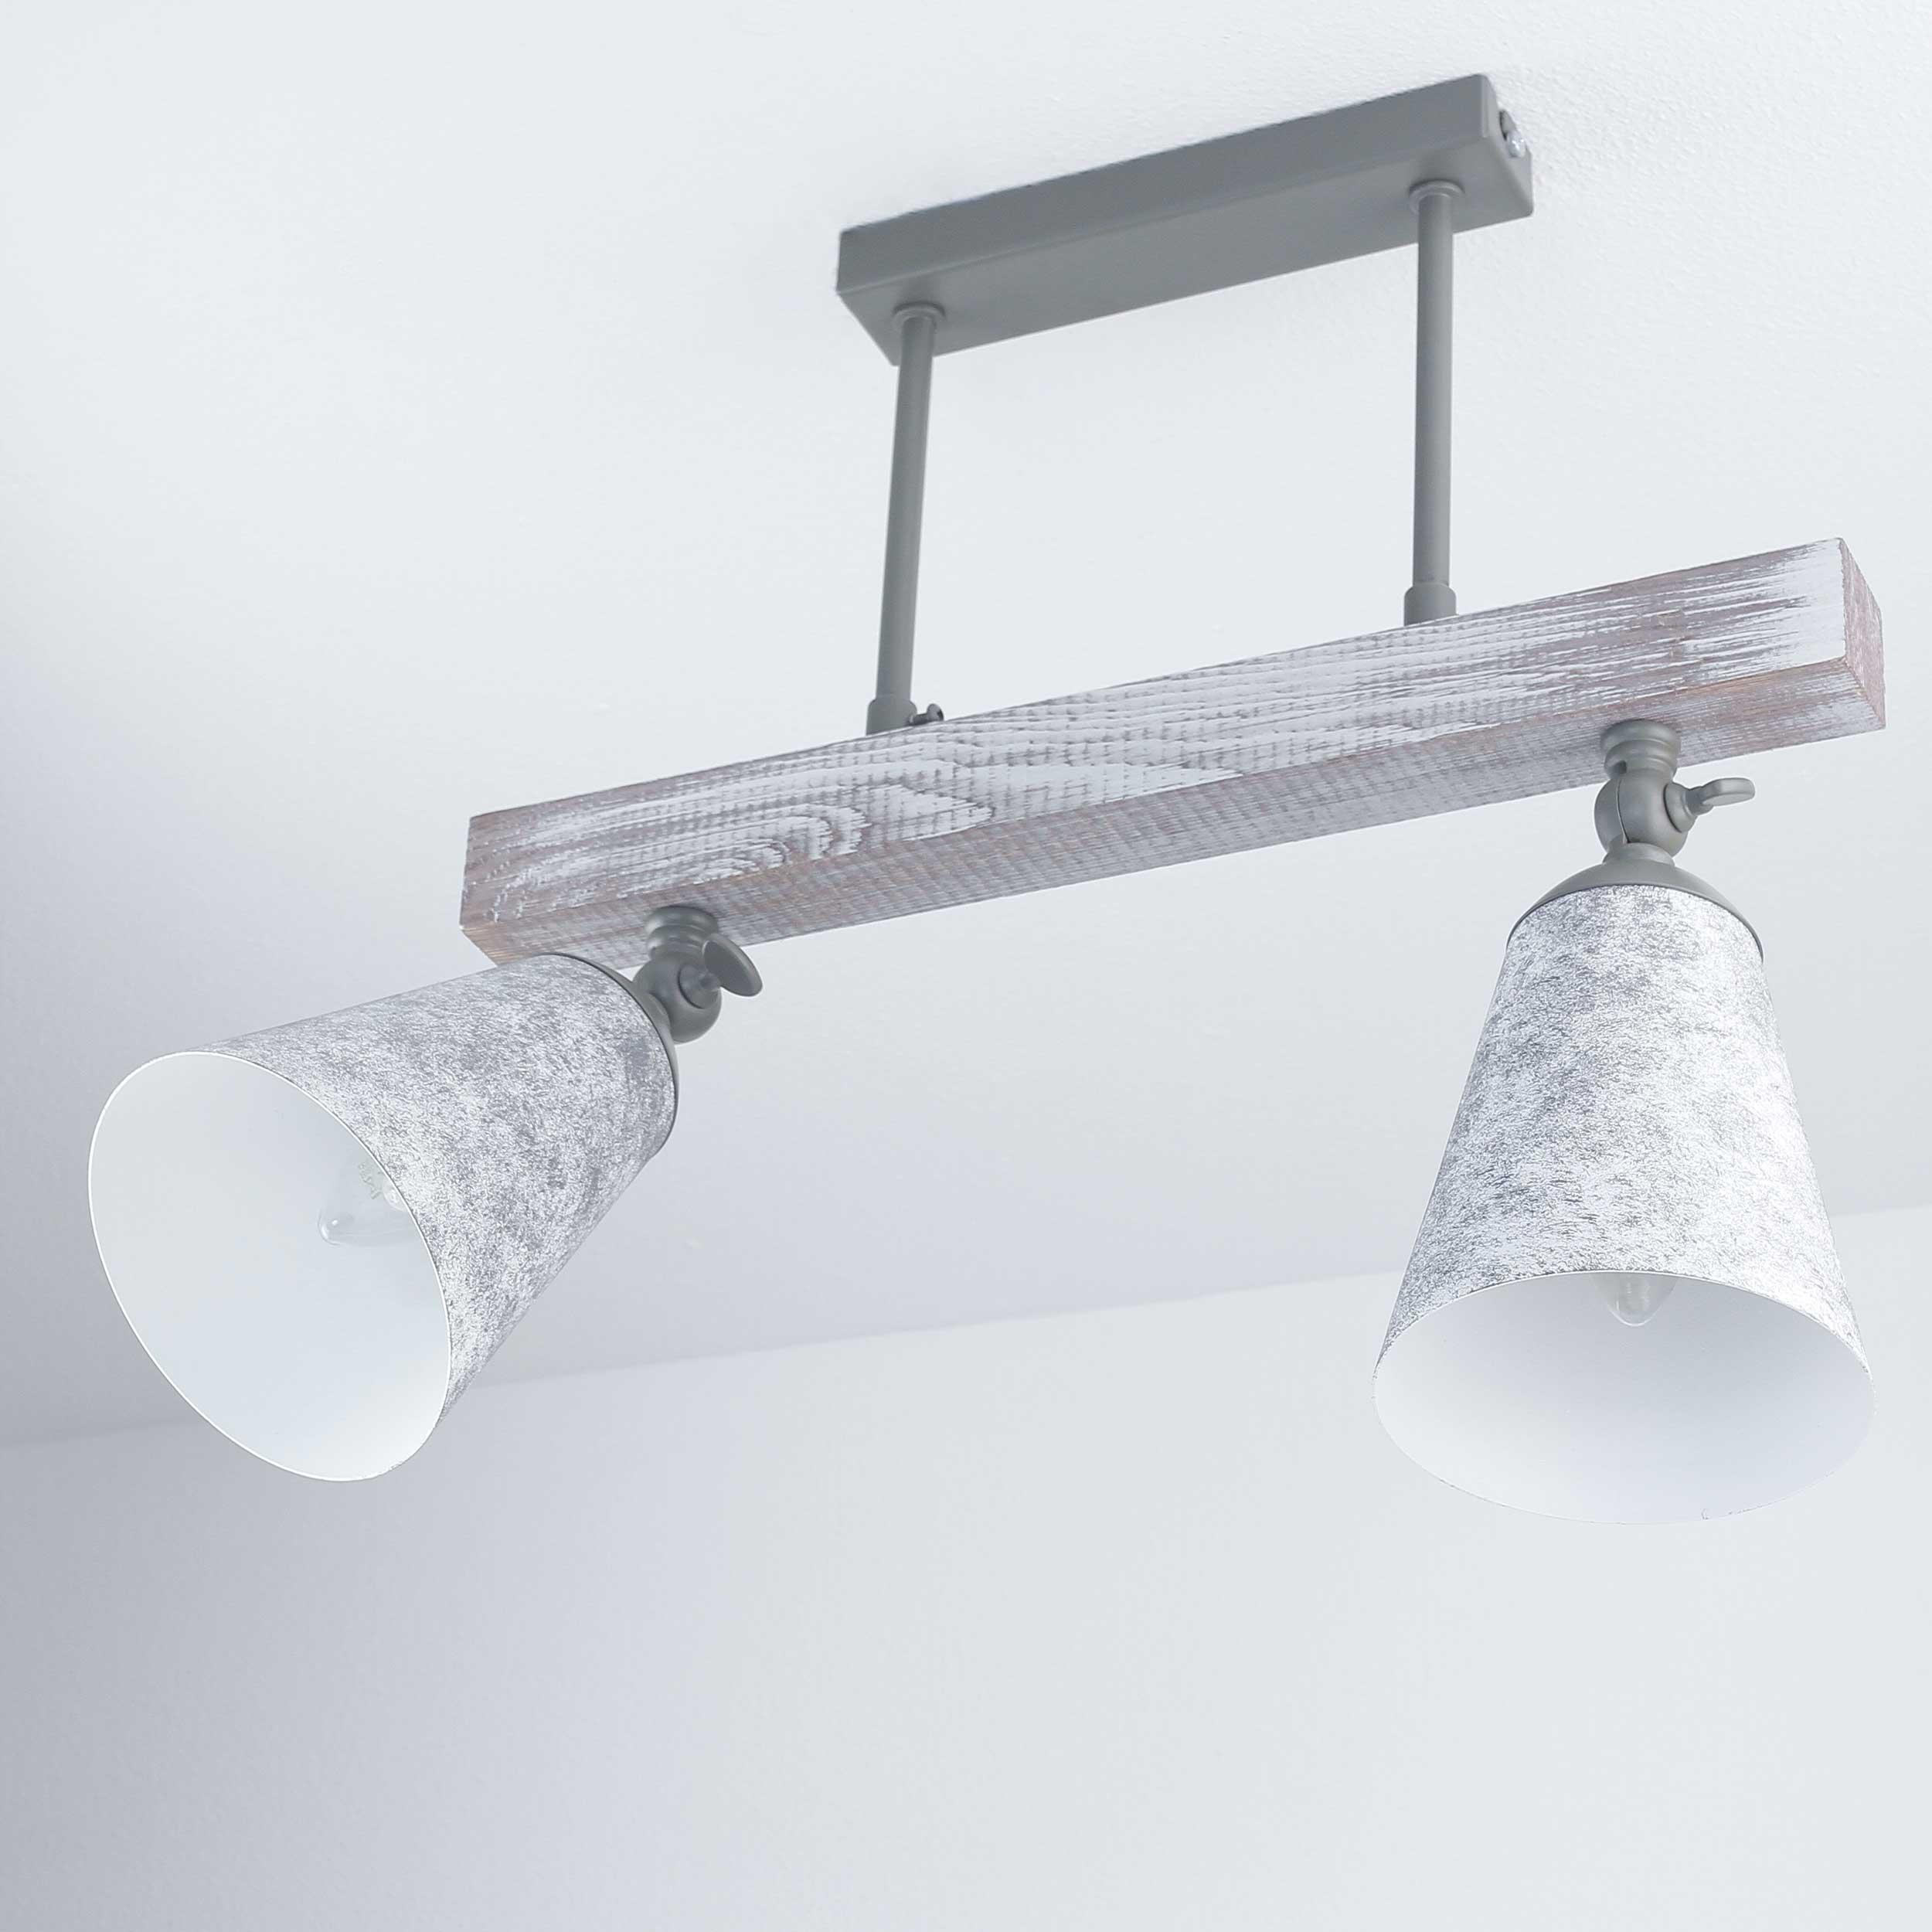 Küche Deckenlampe AGAP Echtholz Shabby Weiß 2xE27